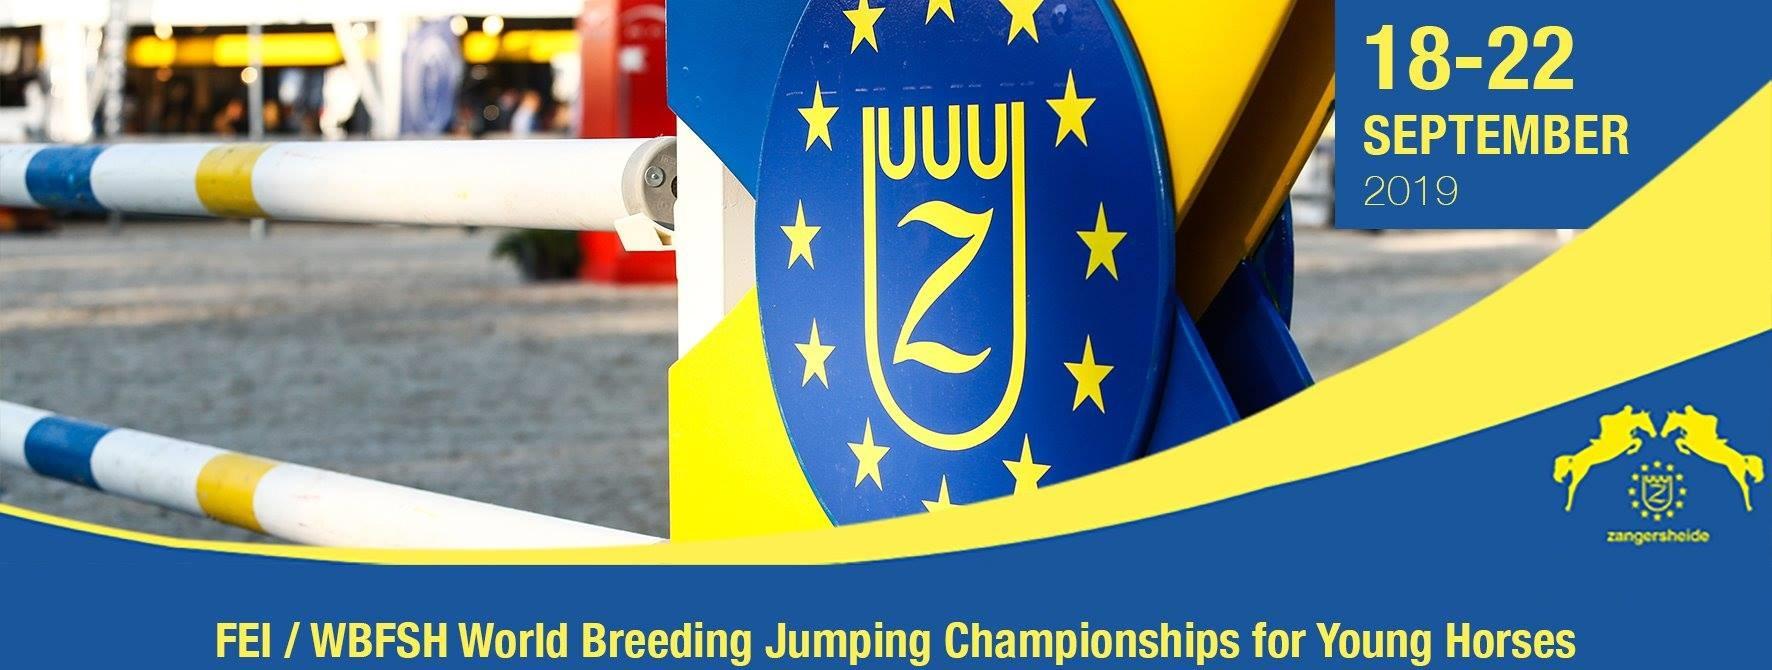 I nostri binomi ai Mondiali Young Horses di Lanaken